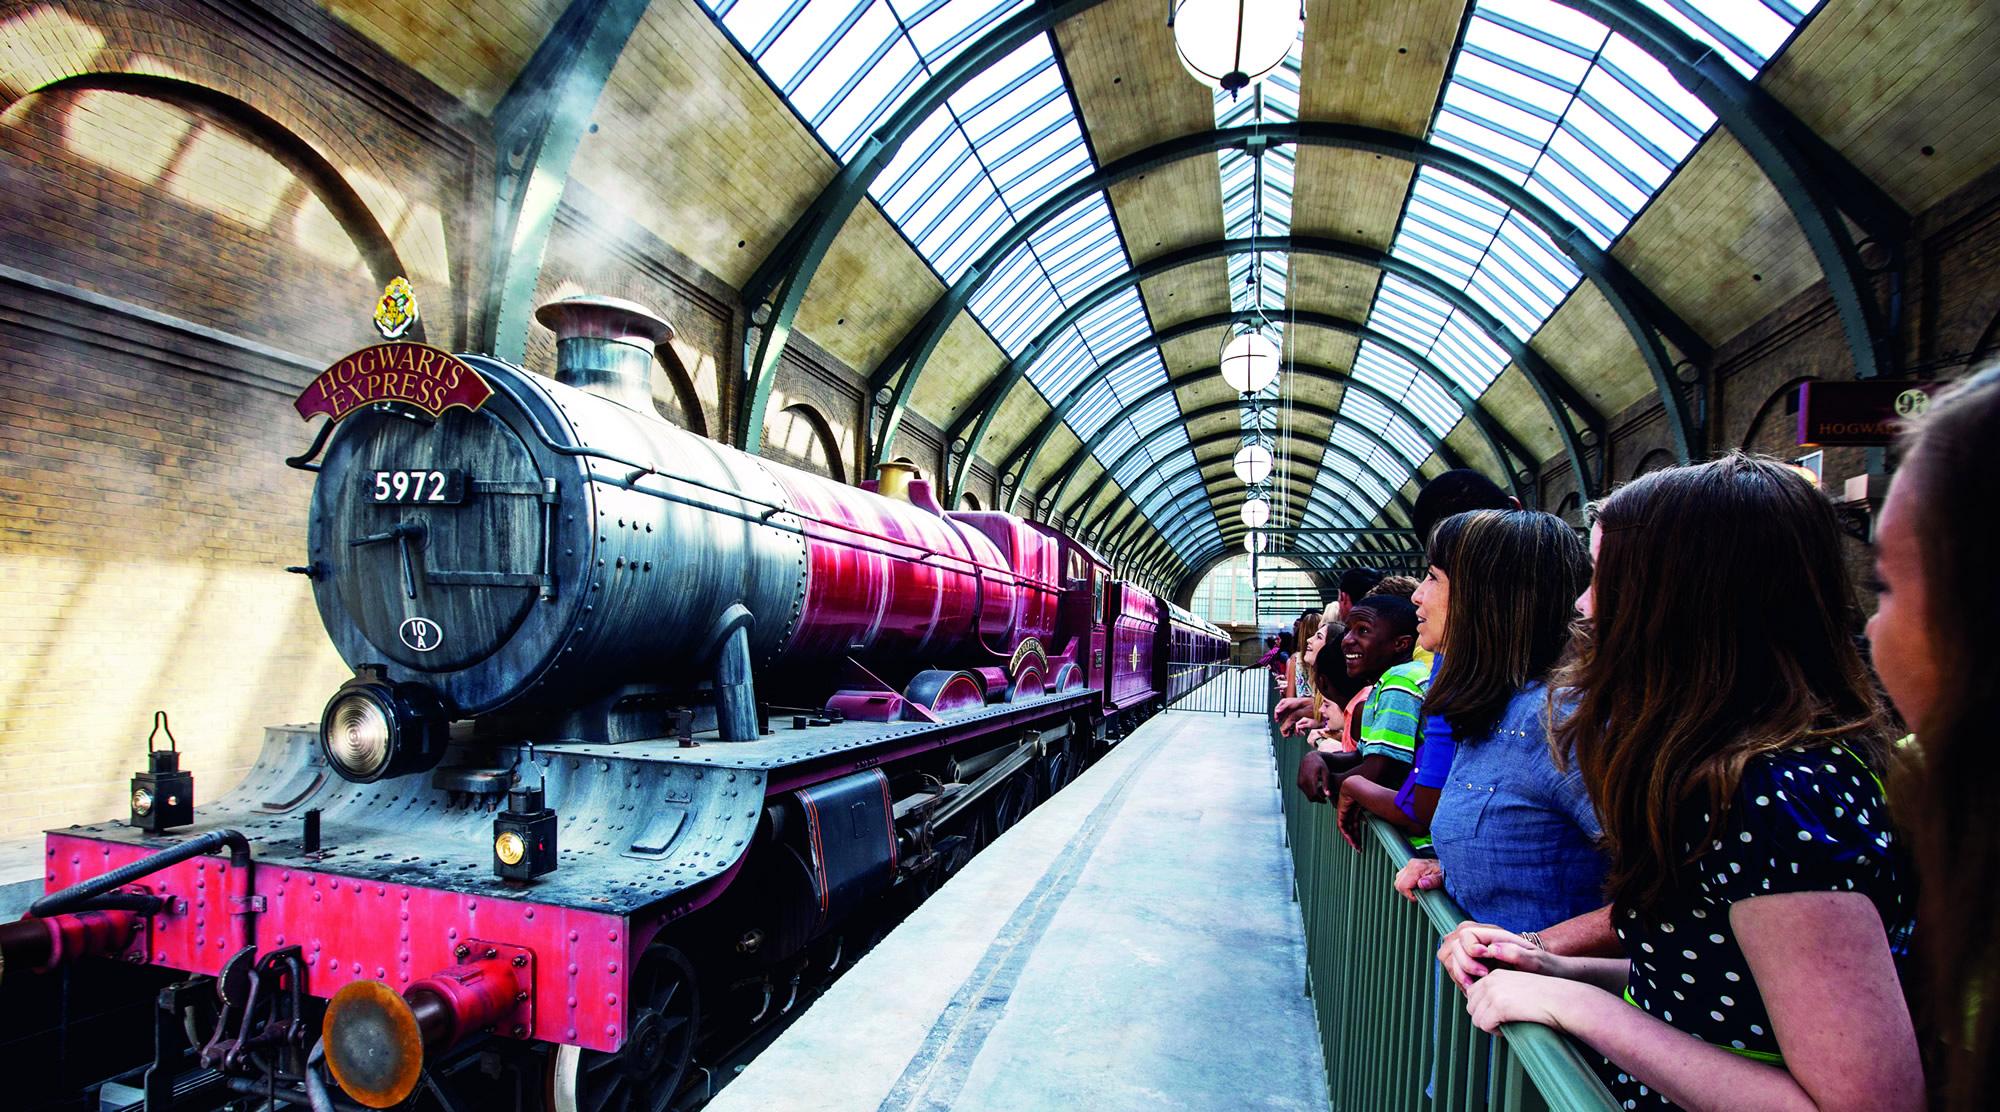 The Hogwarts Express, Universal Stduioops, orlando, FL Photo: Doppelmayr